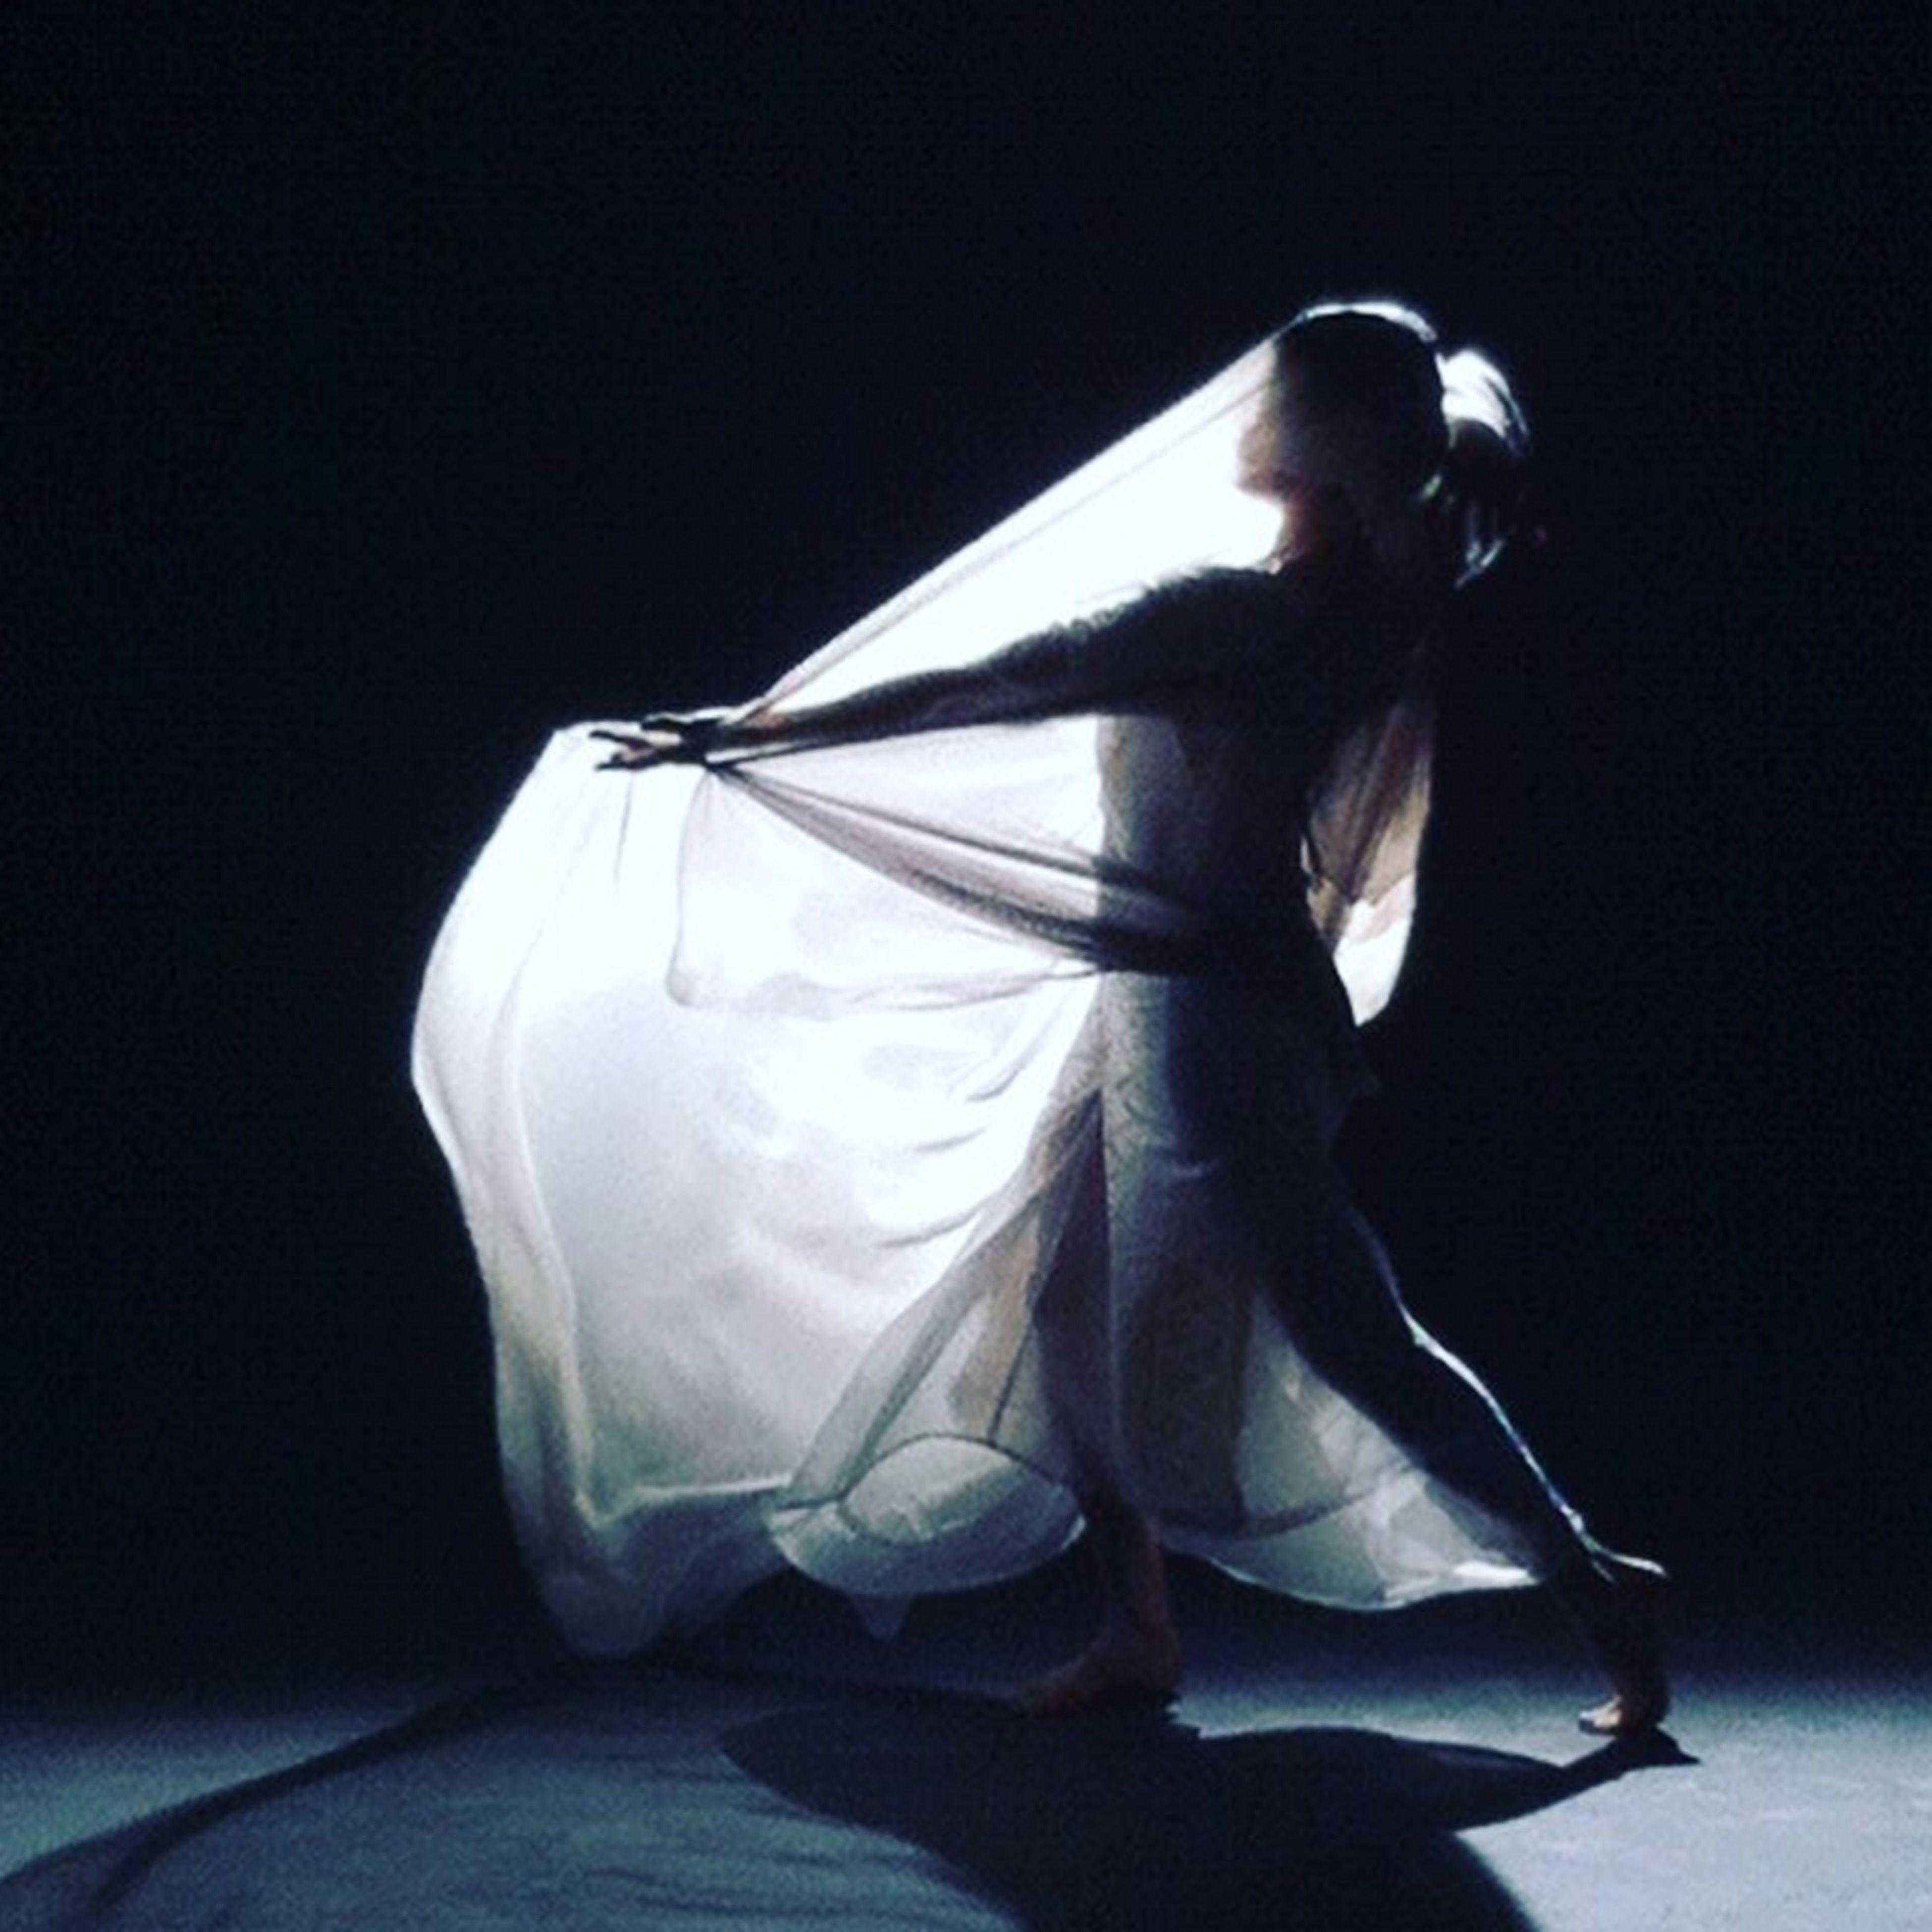 studio shot, one person, black background, animal themes, indoors, ballet, ballet dancer, day